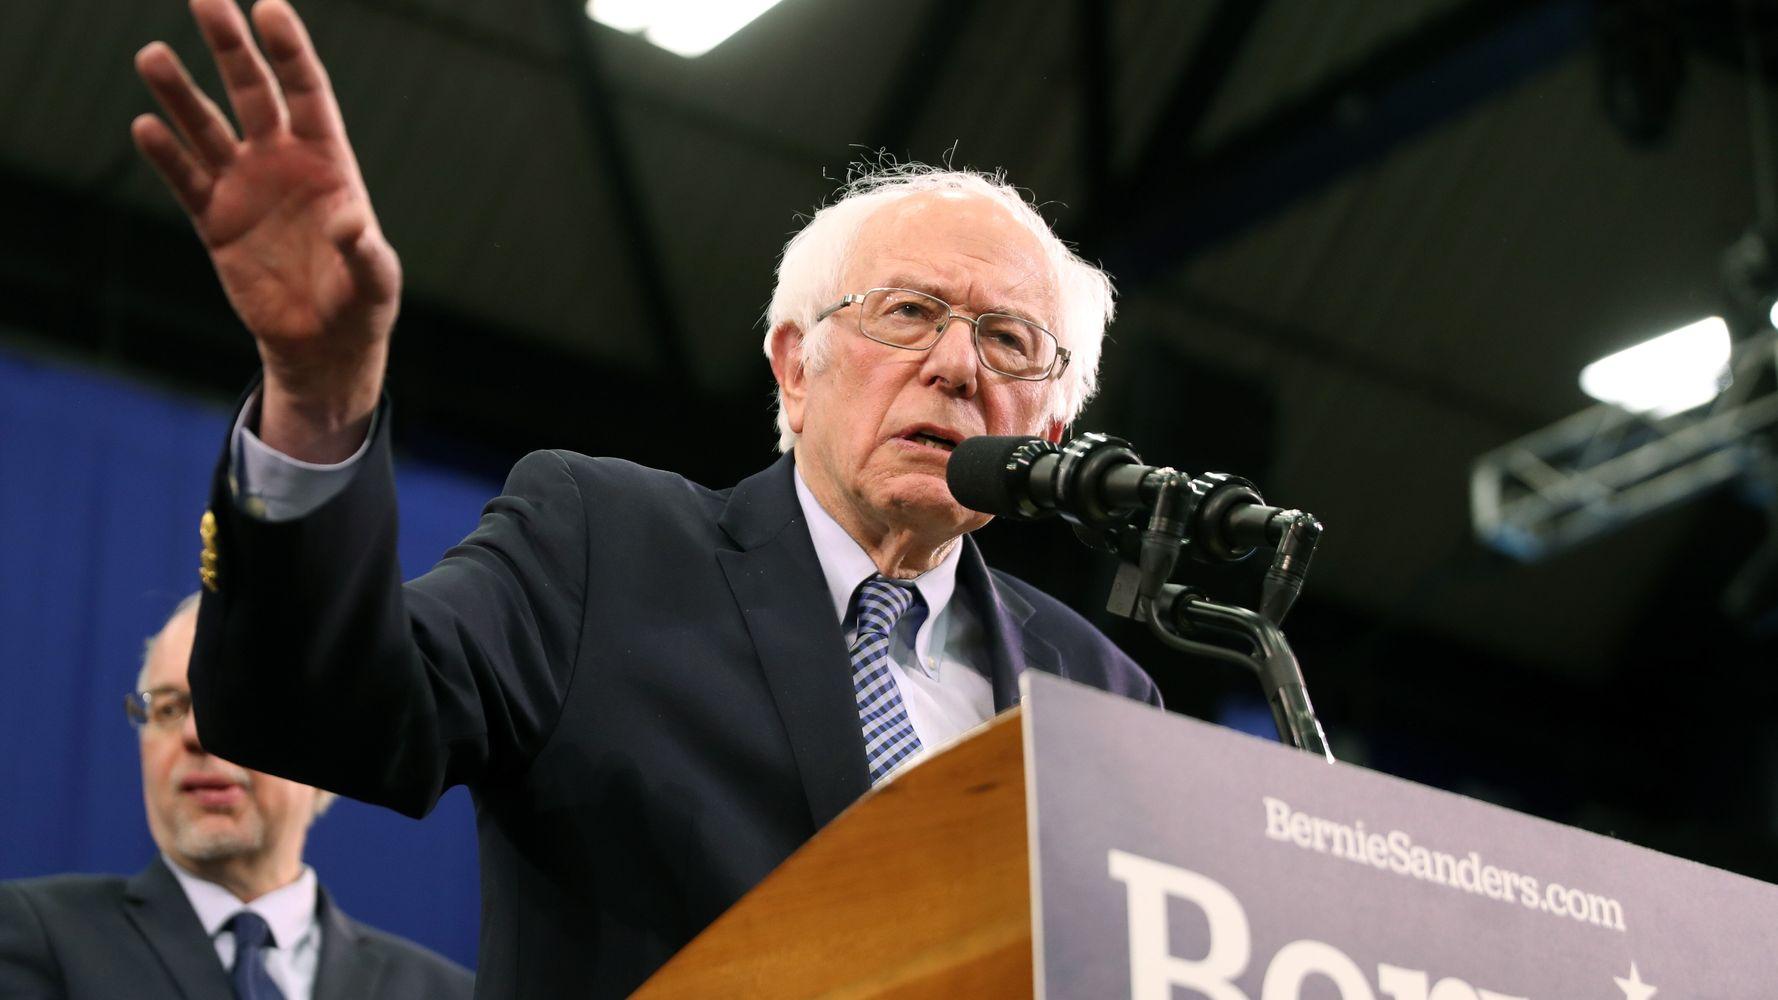 The Big Roadblock For Bernie Sanders' Agenda